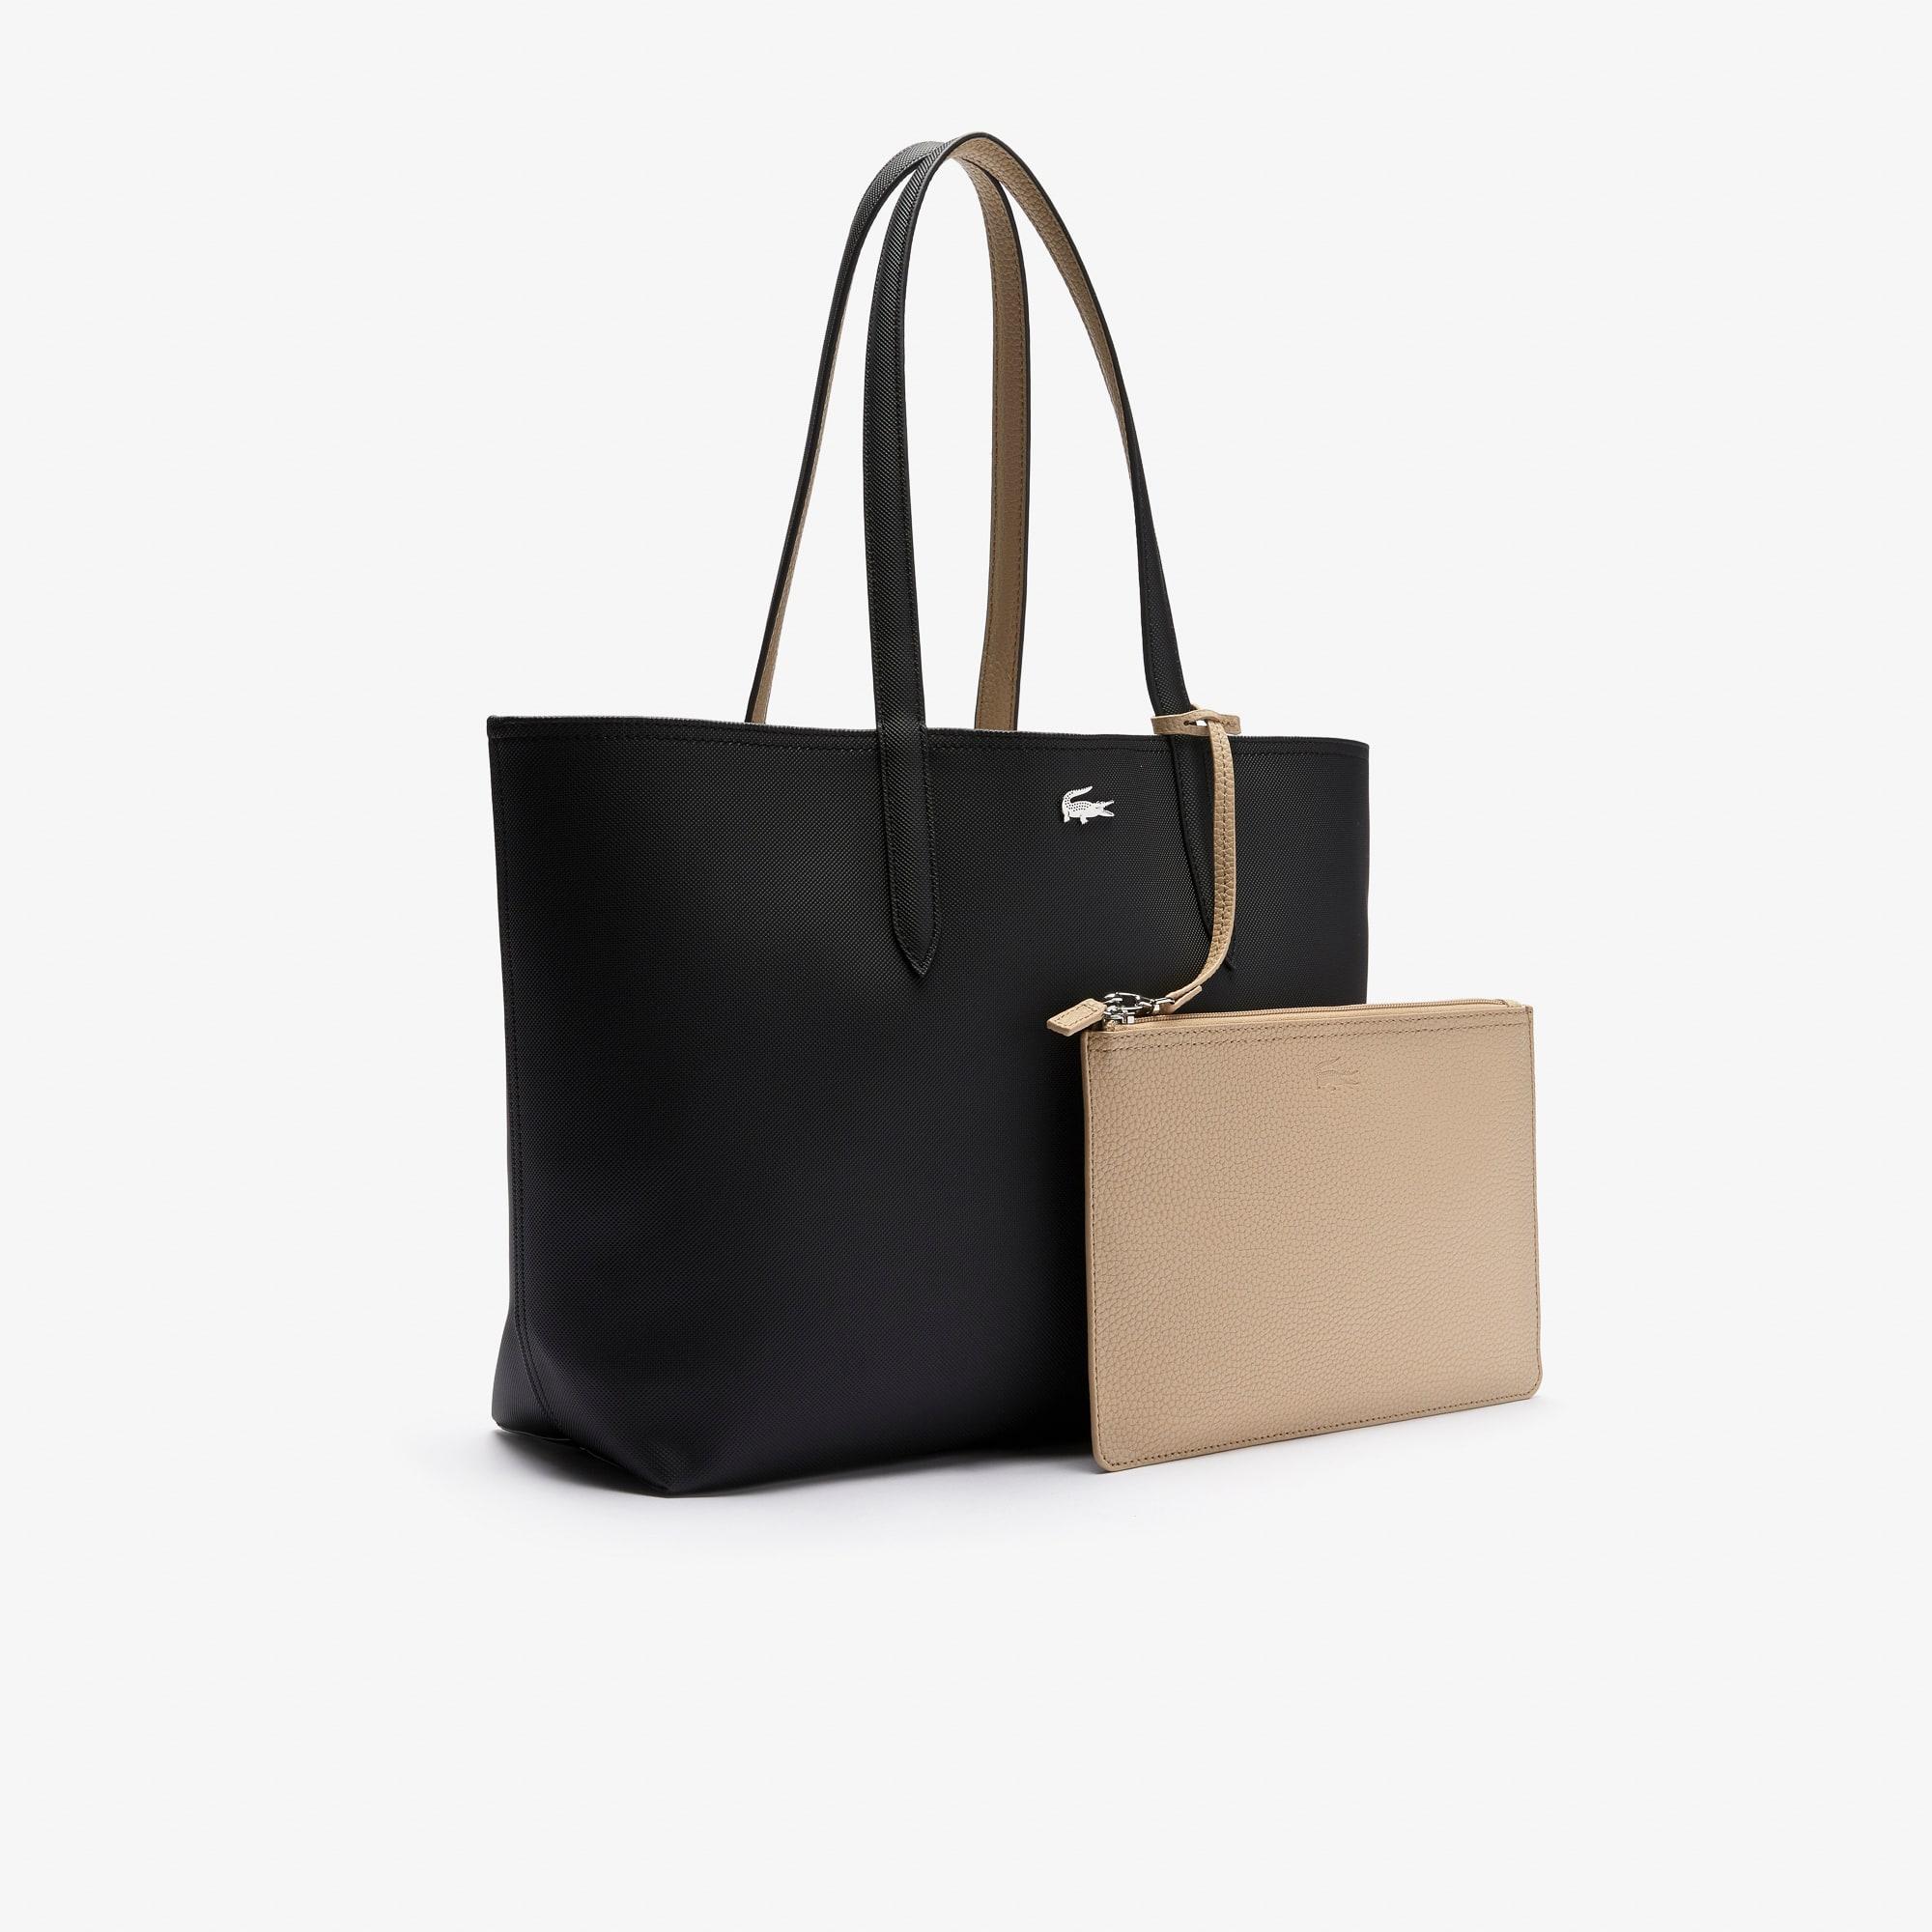 a2a3e30cf0 Women's Anna Reversible Tote Bag | LACOSTE